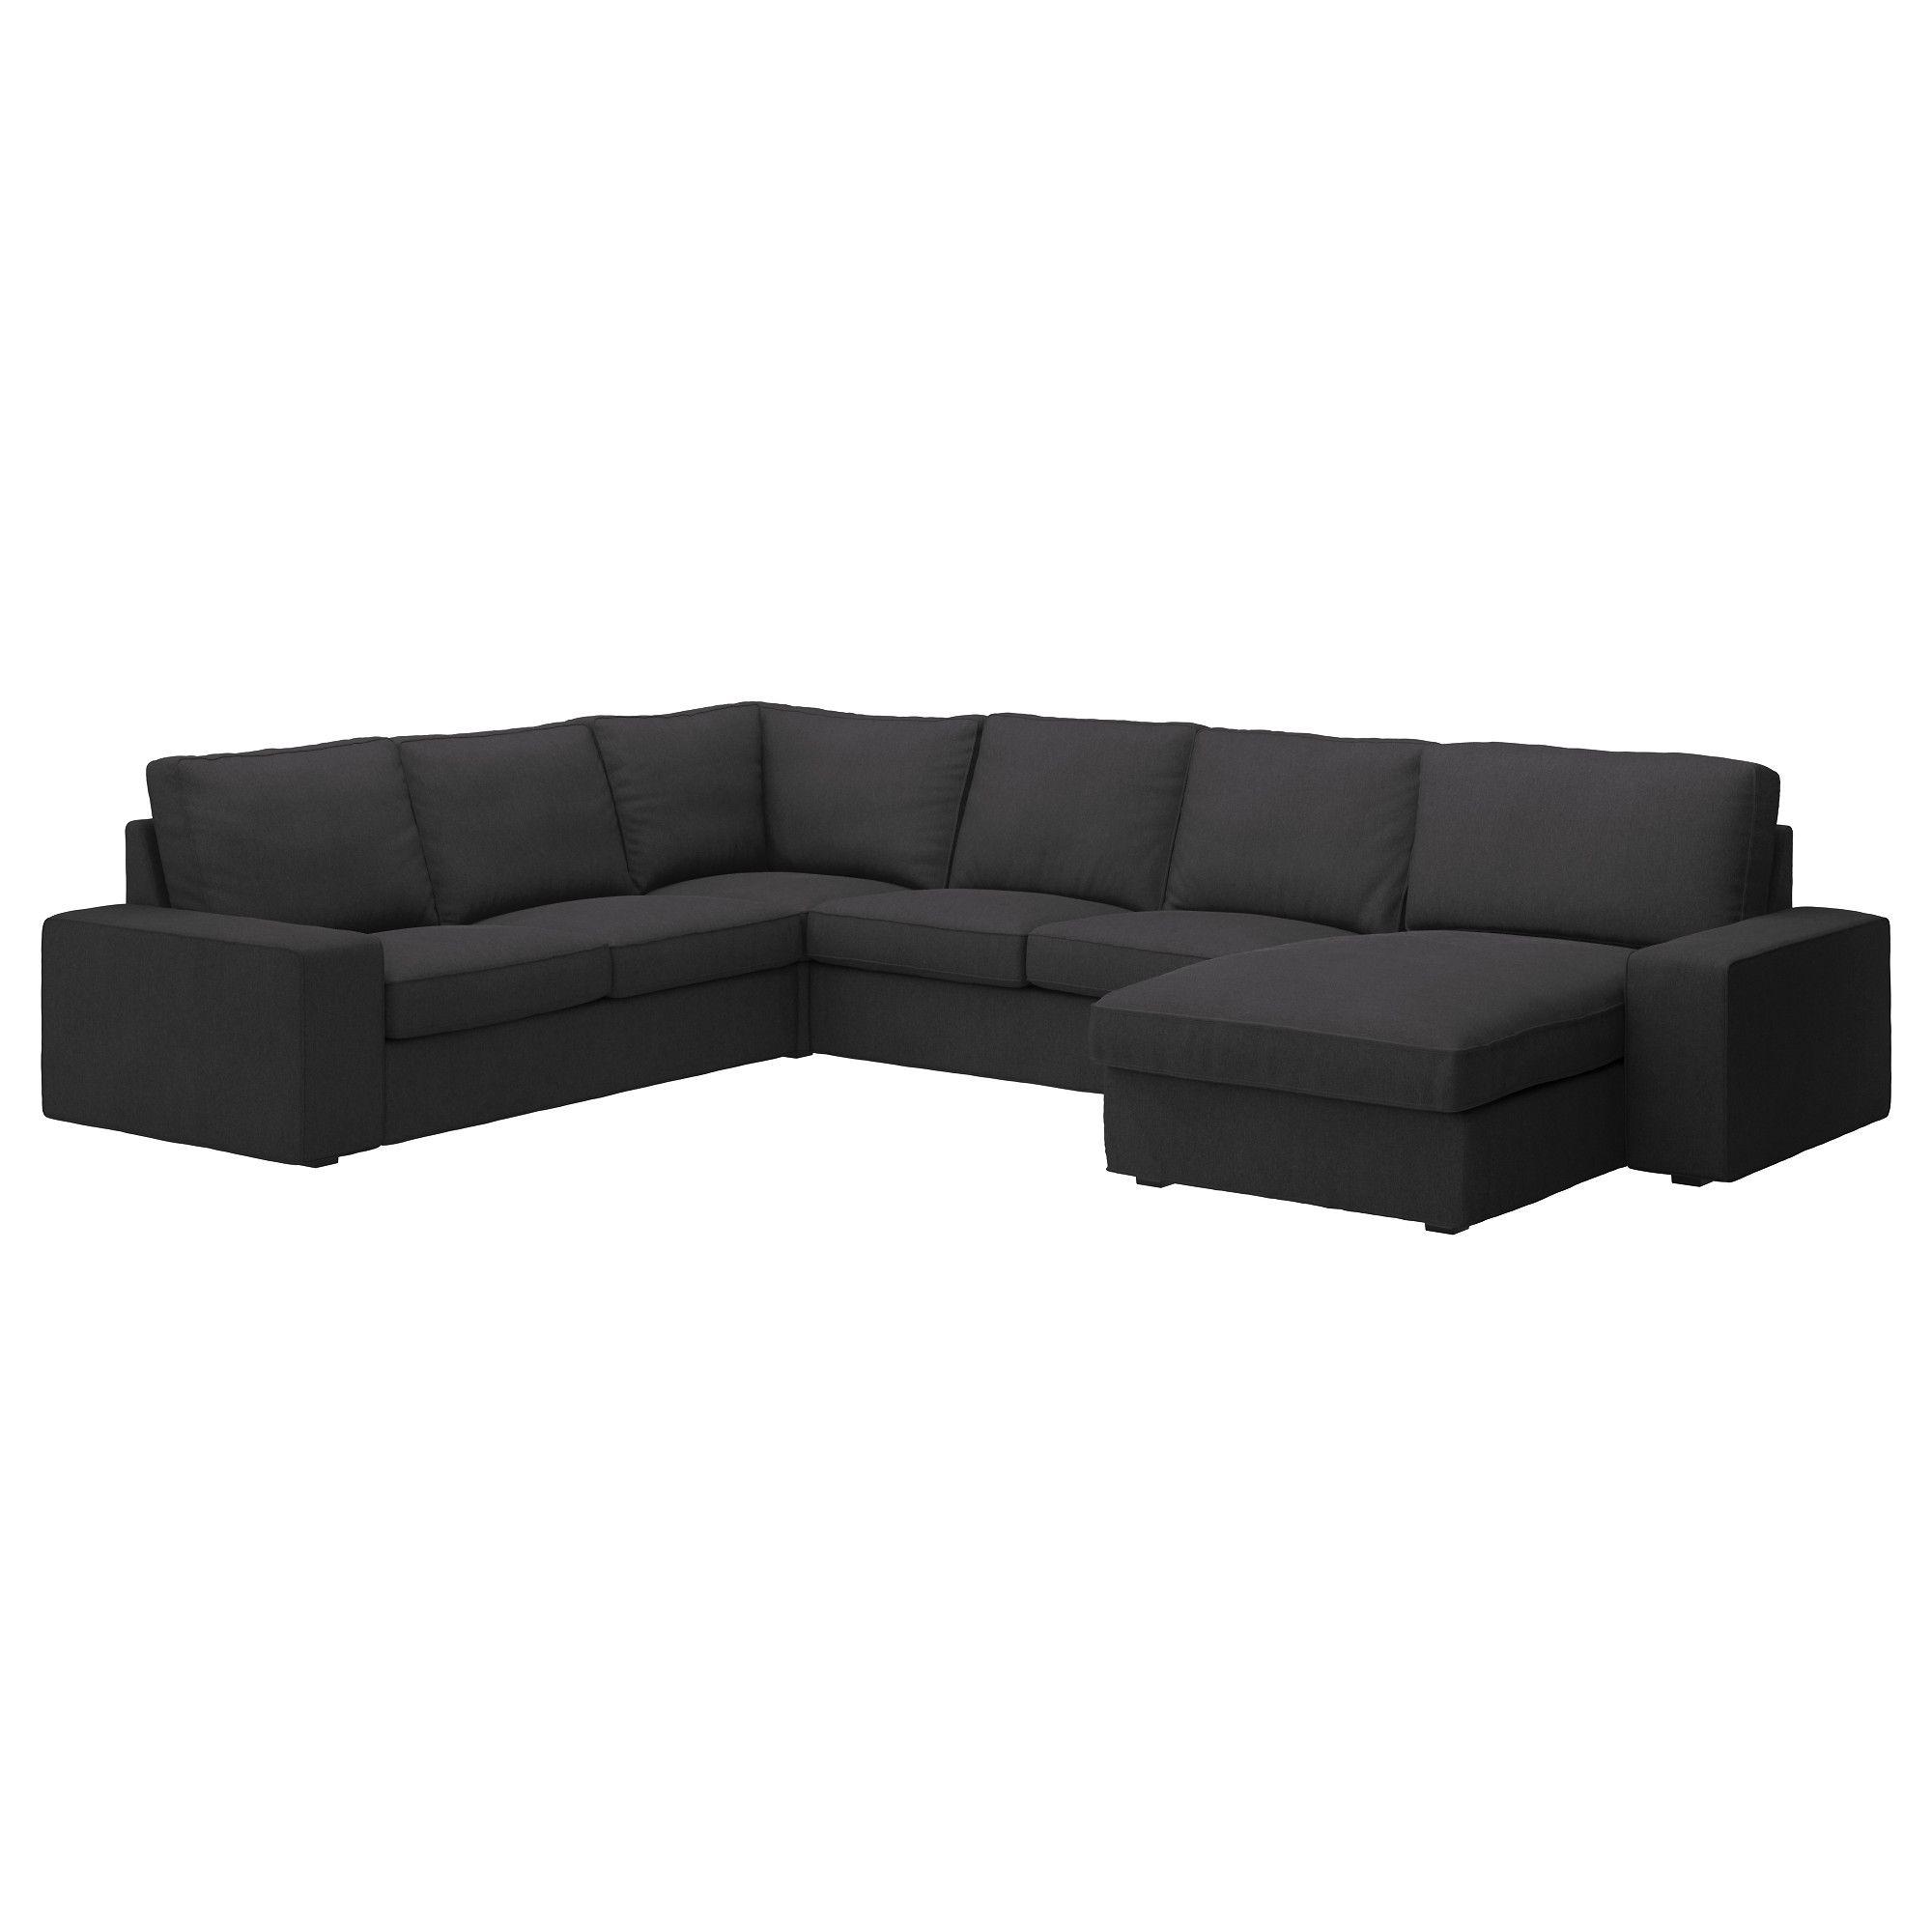 Ikea Us Furniture And Home Furnishings Ikea Sectional Corner